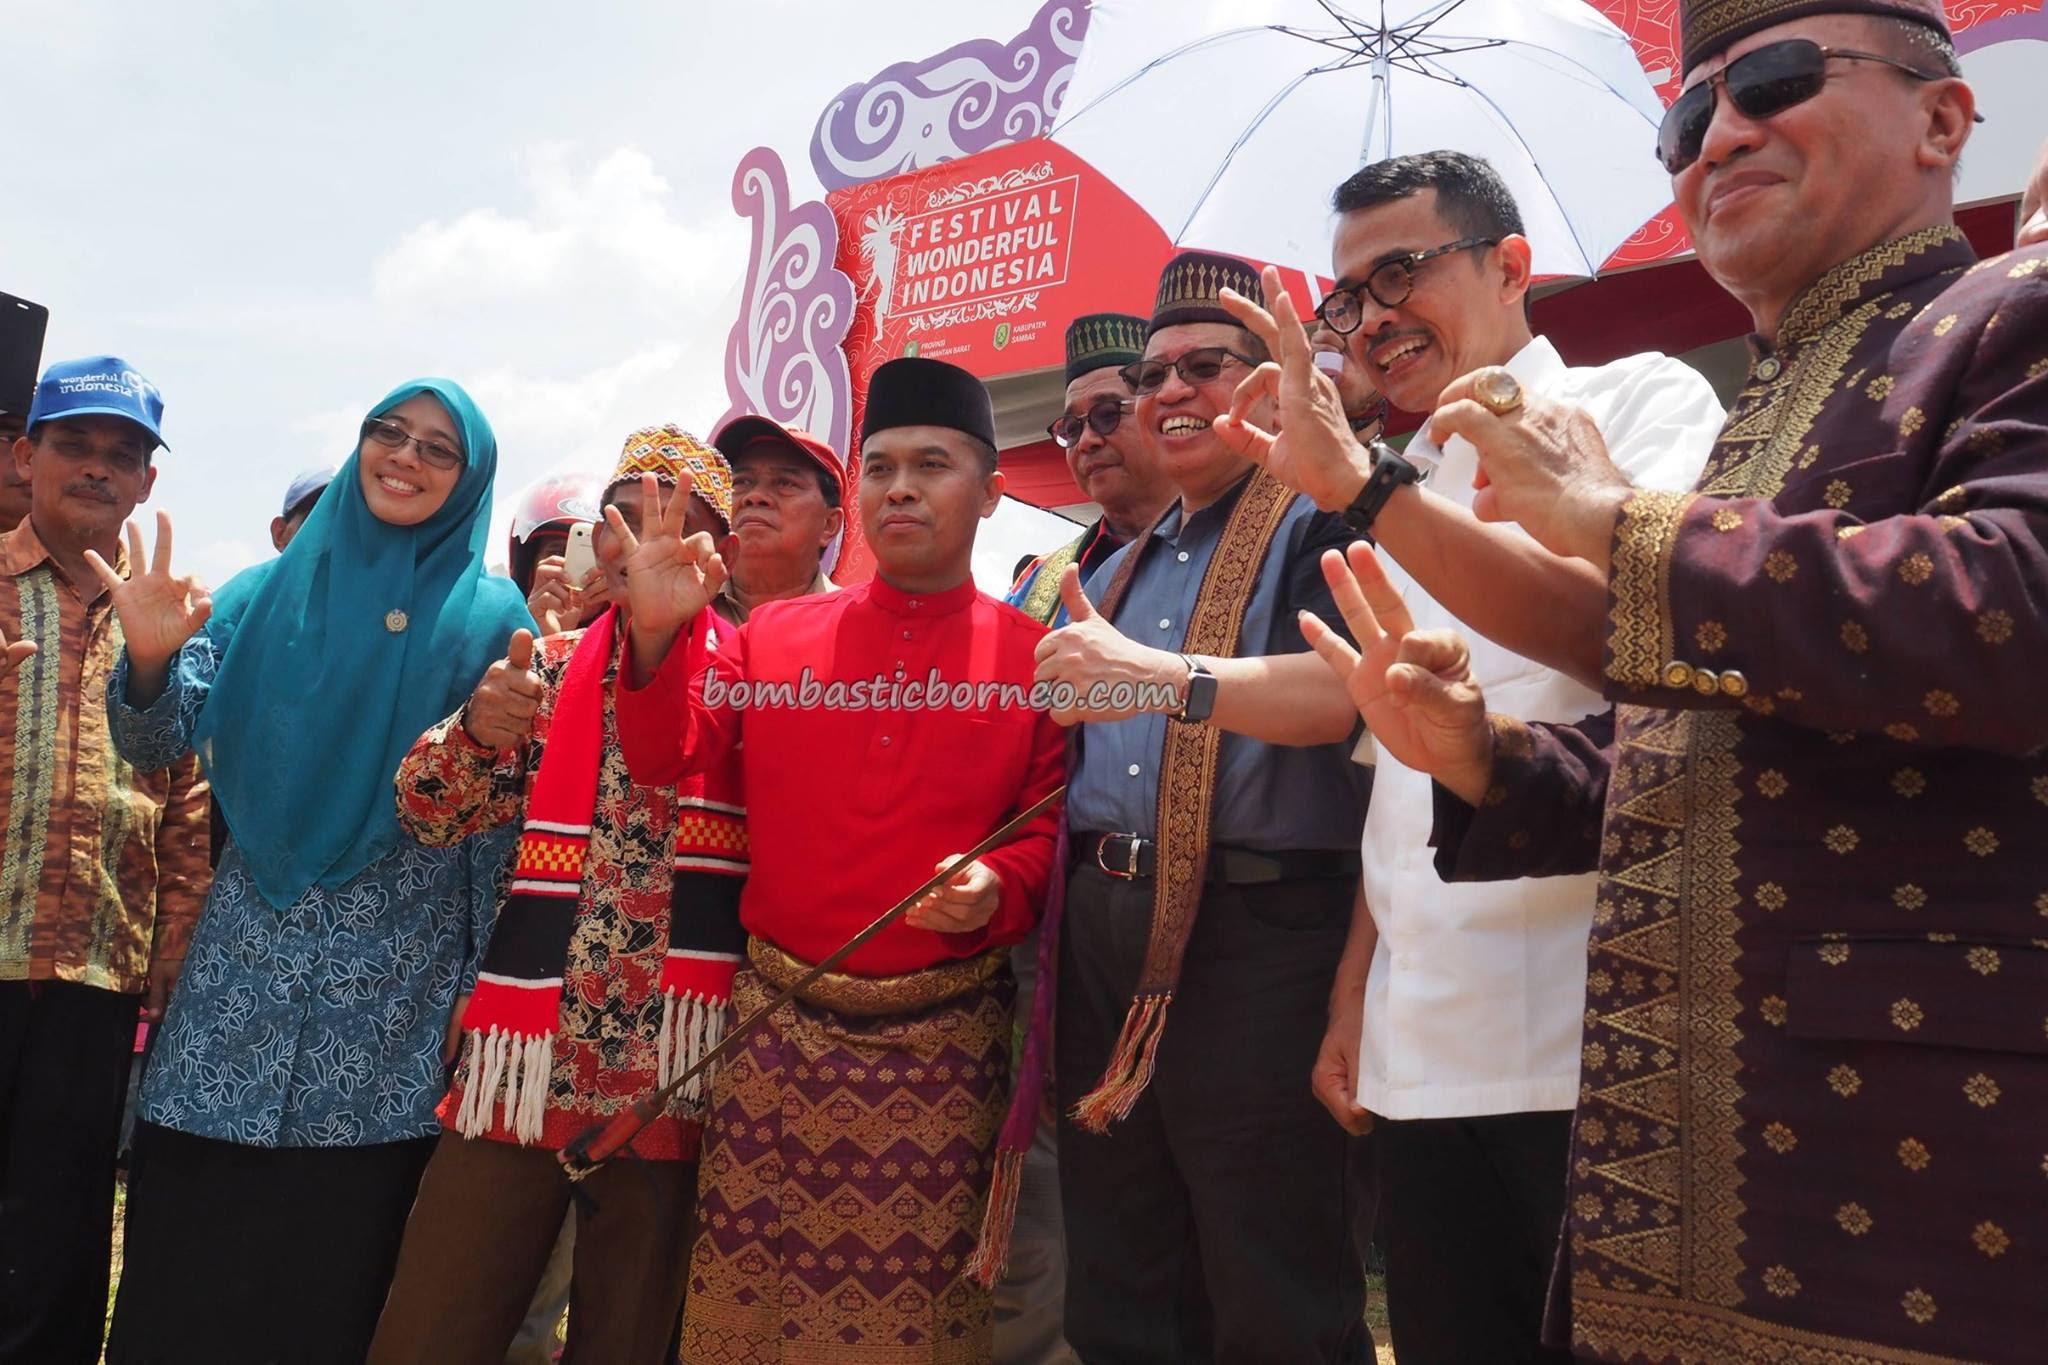 Festival Wonderful Indonesia, Aruk West Kalimantan Barat  BOMBASTIC BORNEO